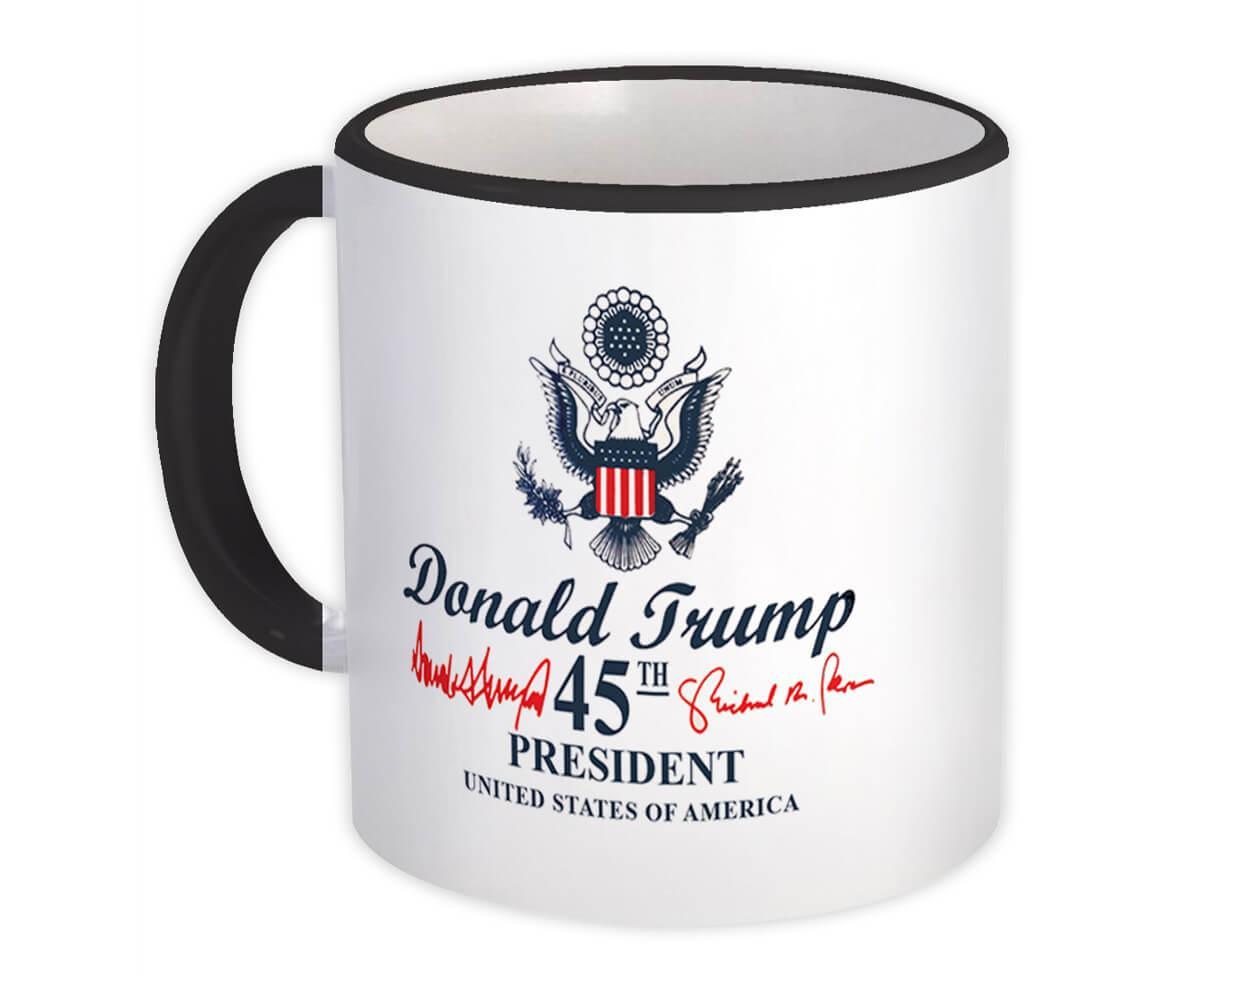 Donald Trump 45th President : Gift Mug USA Crest Flag Eagle Presidential Seal